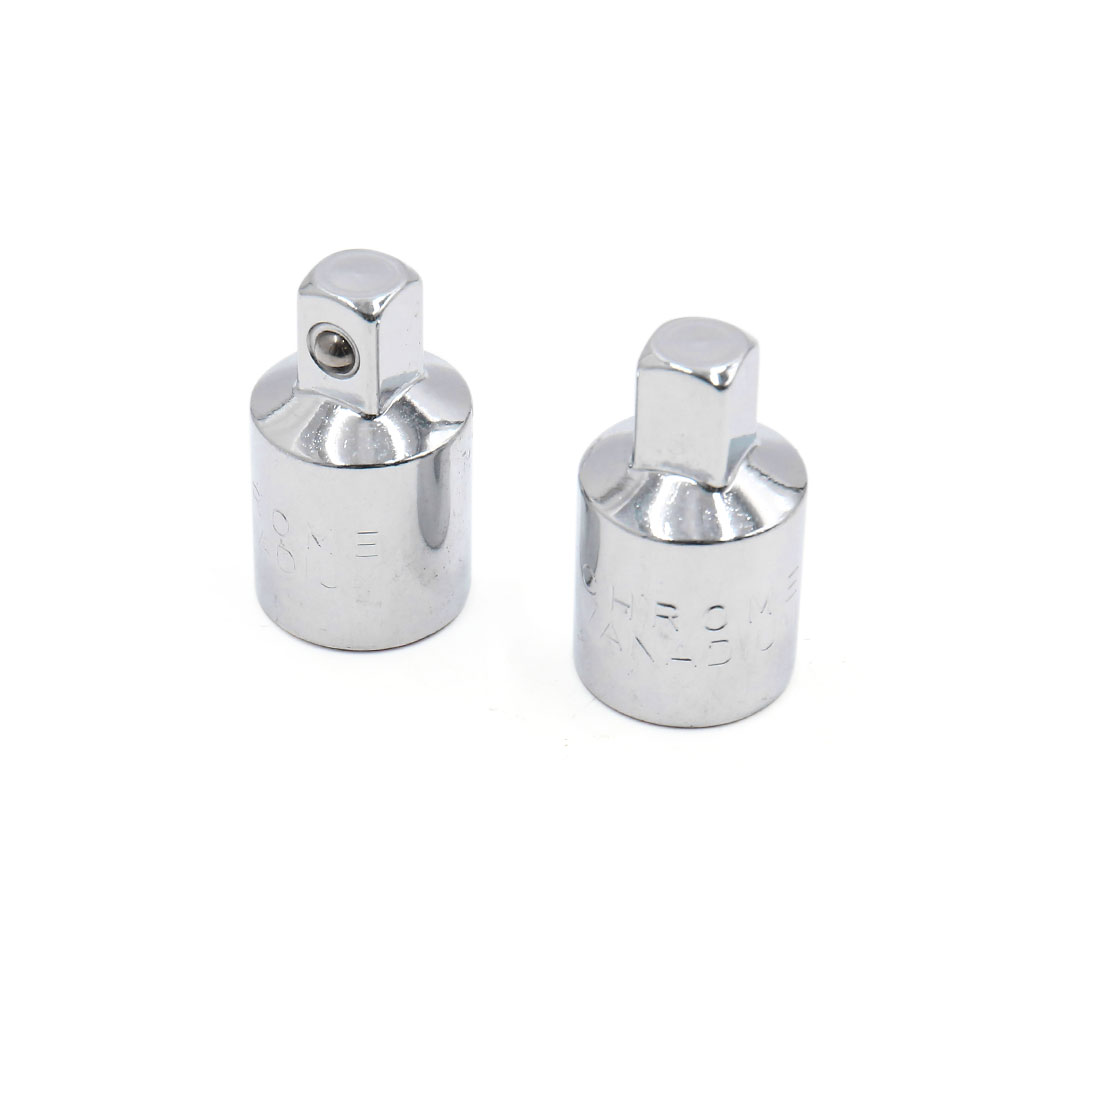 "2Pcs 3/8"" Square Head 1/2"" Socket Car Wrench Ratchet Converter Reducer Adapter"